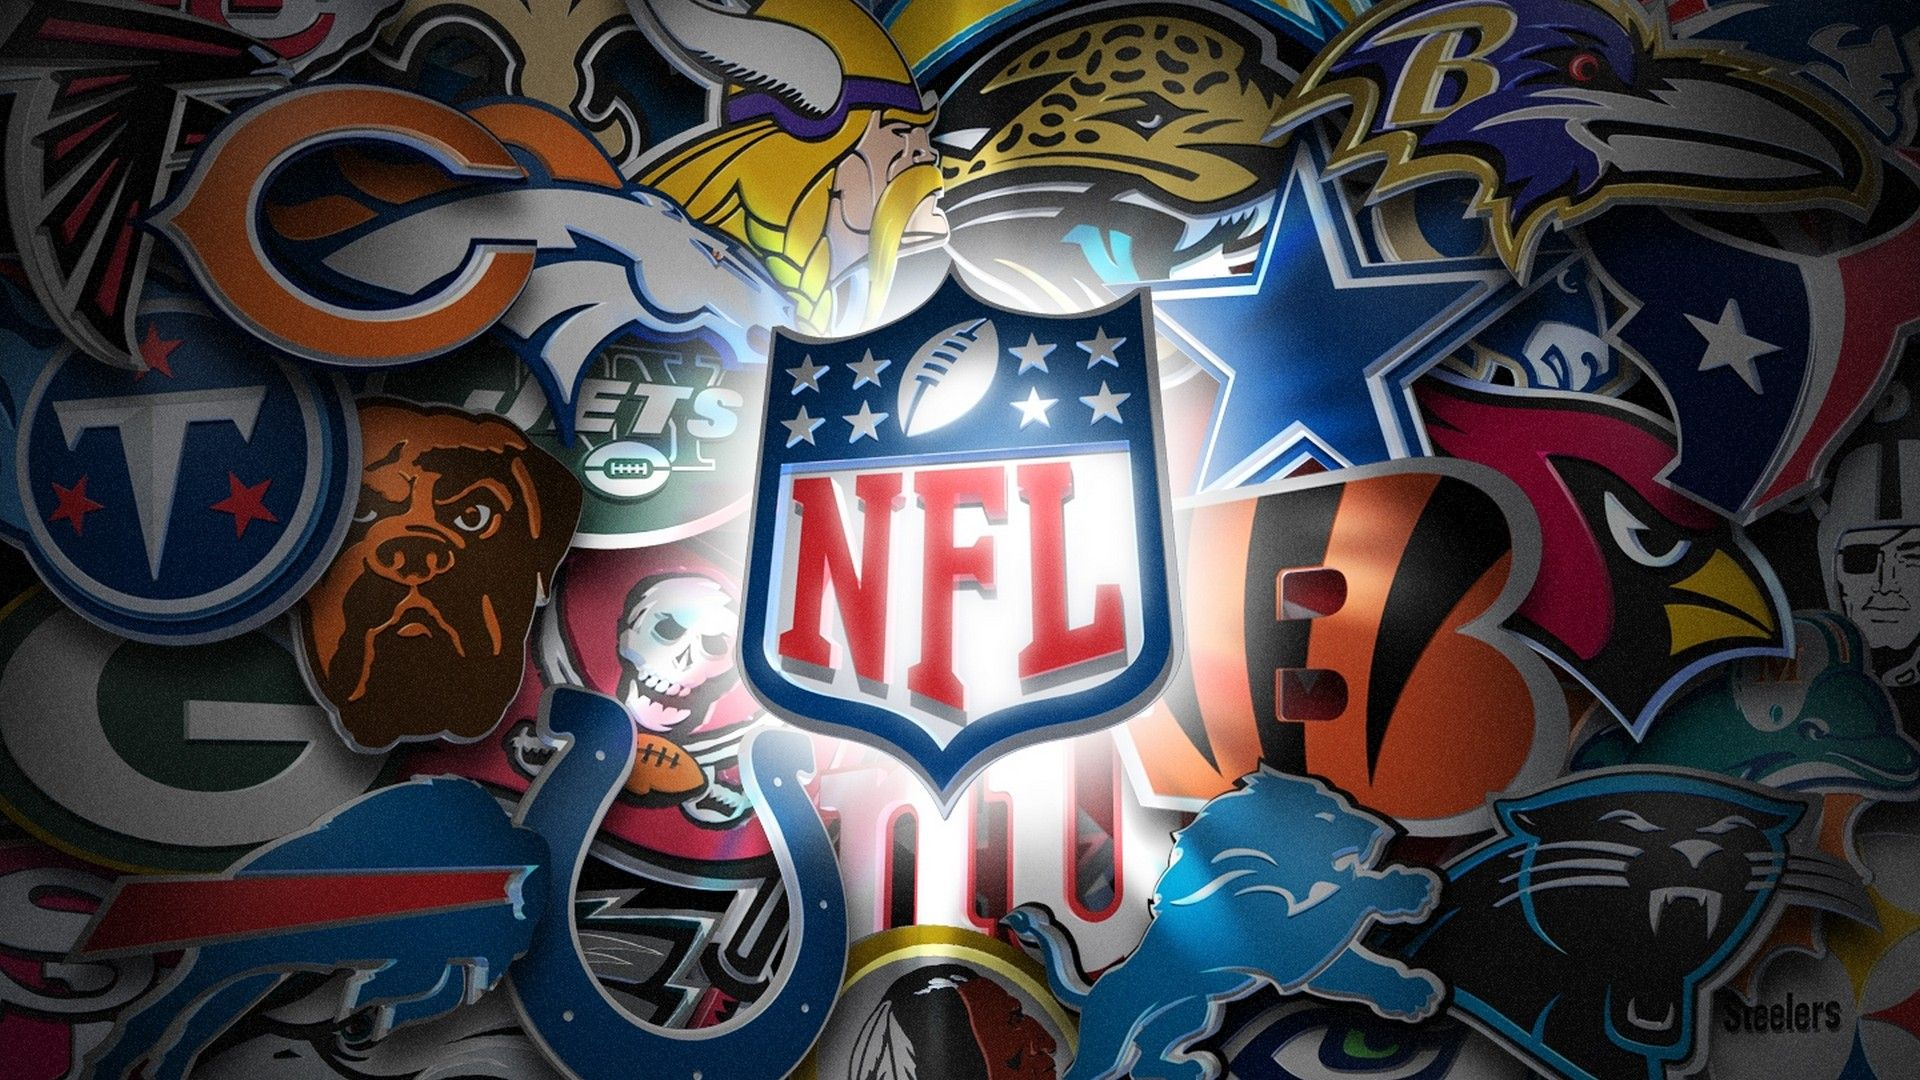 Nfl Wallpapers Nfl Teams Logos Football Wallpaper Nfl Logo